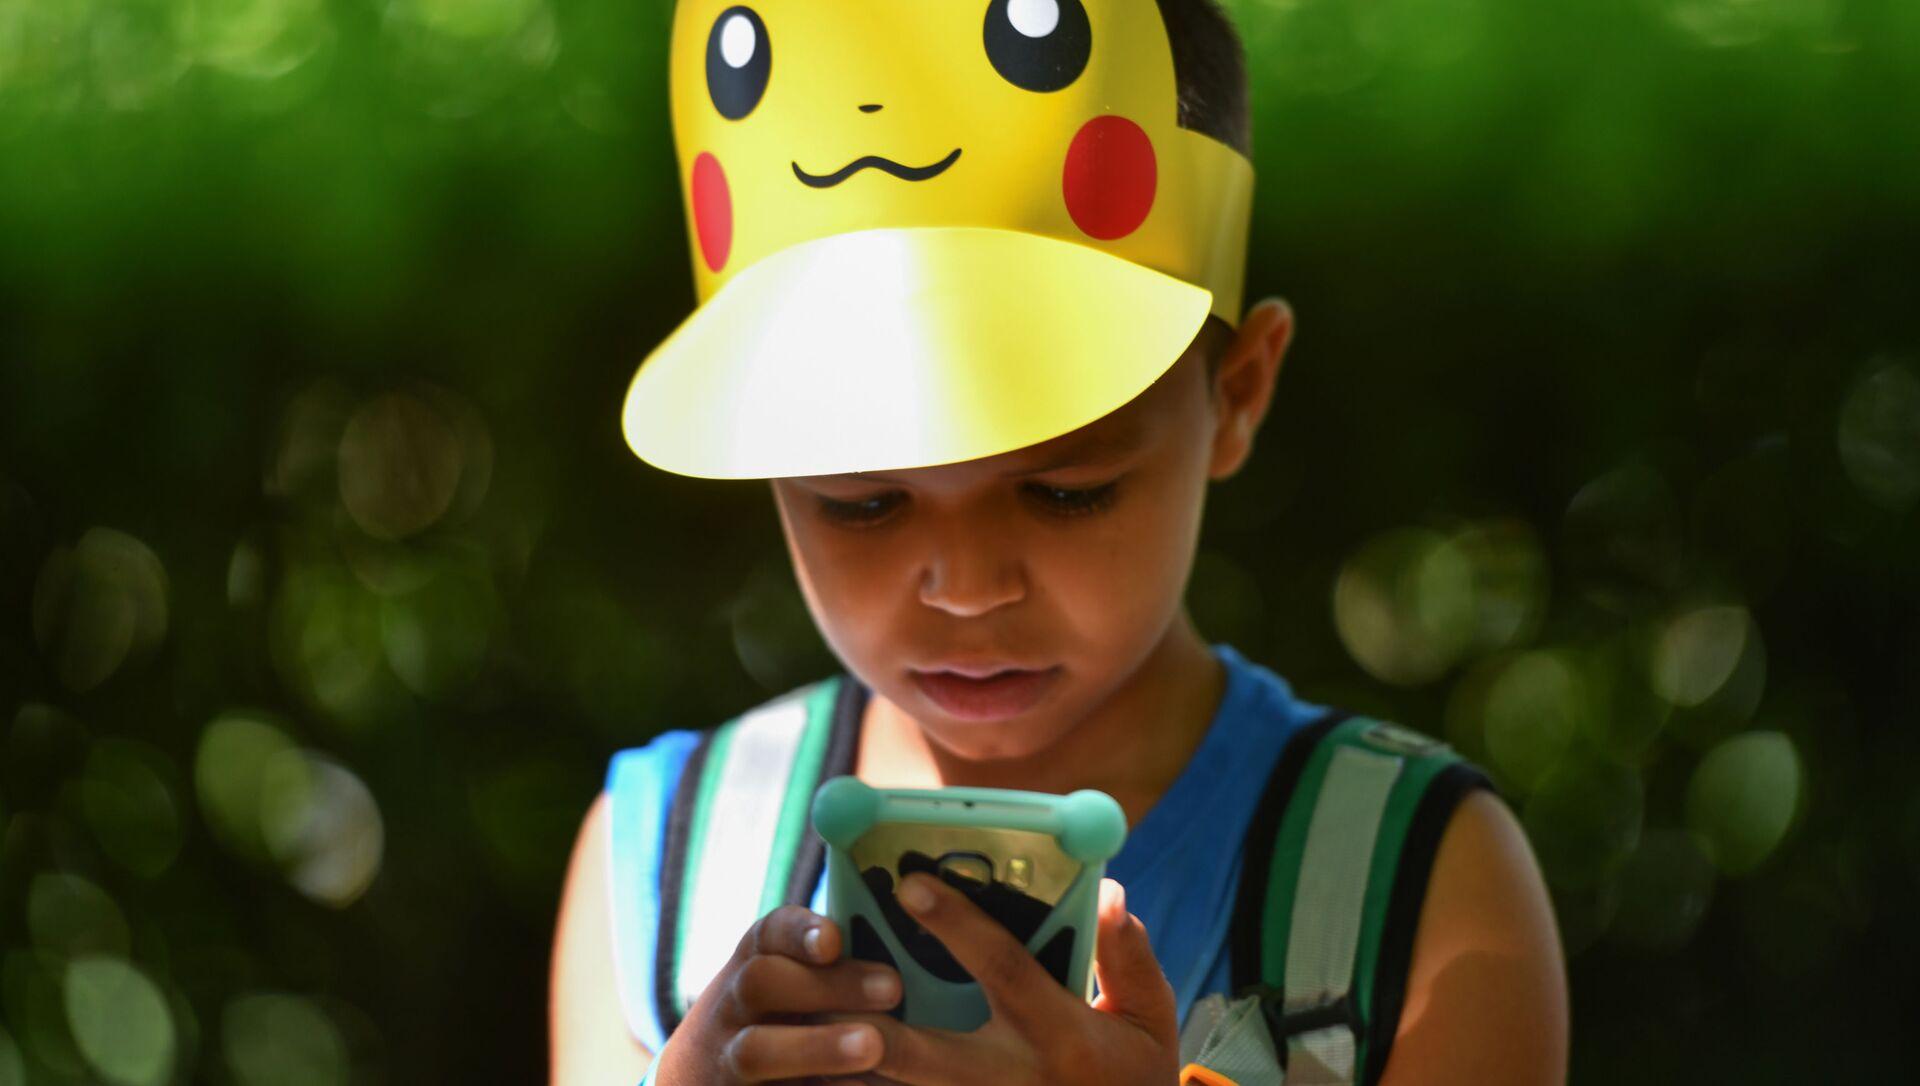 Un niño jugando a Pokémon Go - Sputnik Mundo, 1920, 05.09.2020